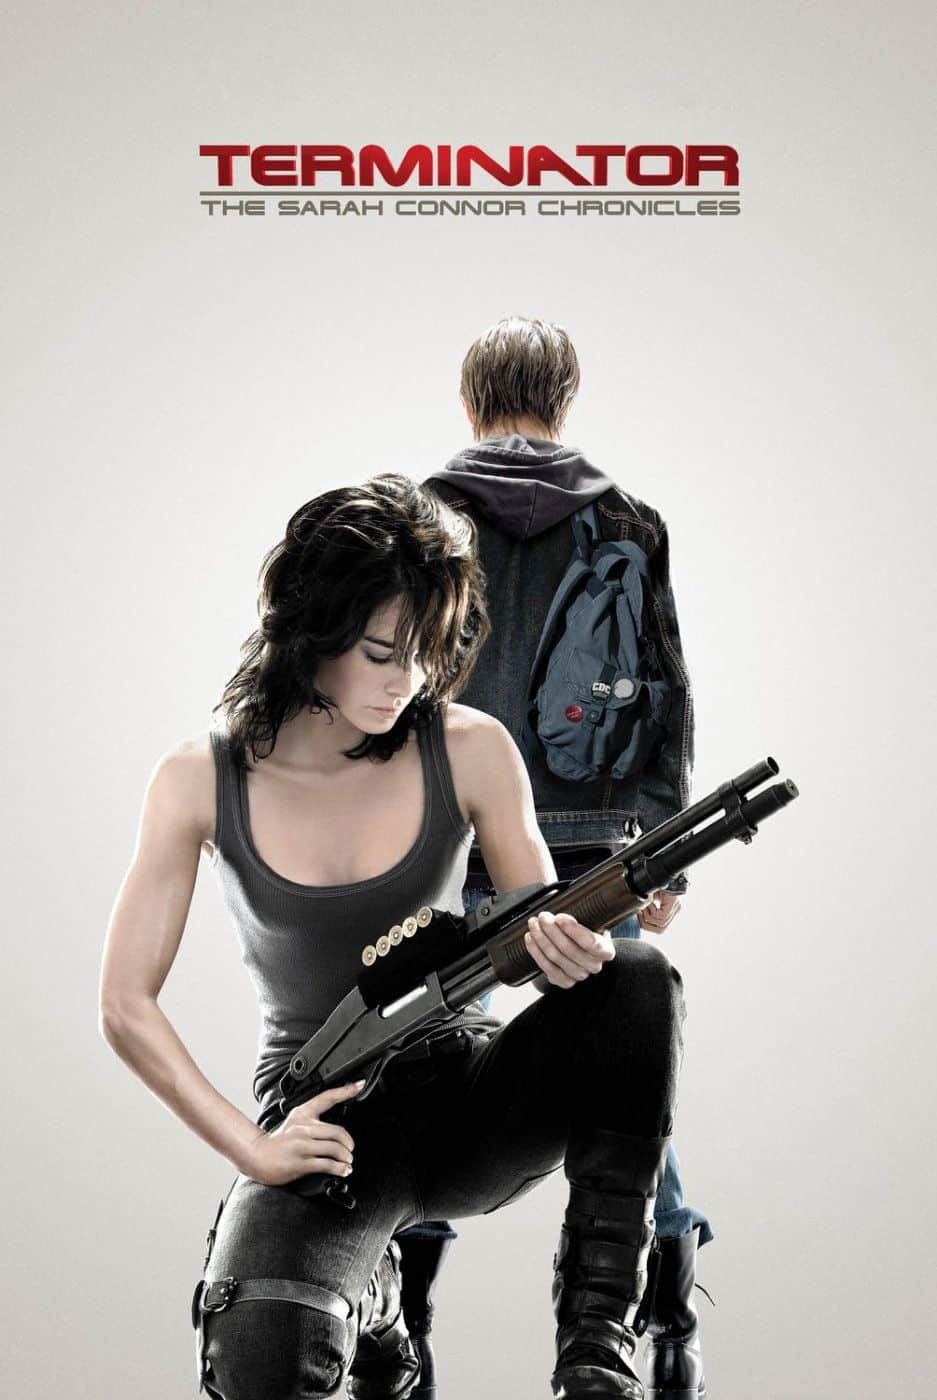 Terminator The Sarah Connor Chronicles Season 1 เทอร์มิเนเตอร์ กำเนิดสงครามคนเหล็ก ปี 1 ซับไทย EP1 – EP9 [จบ]